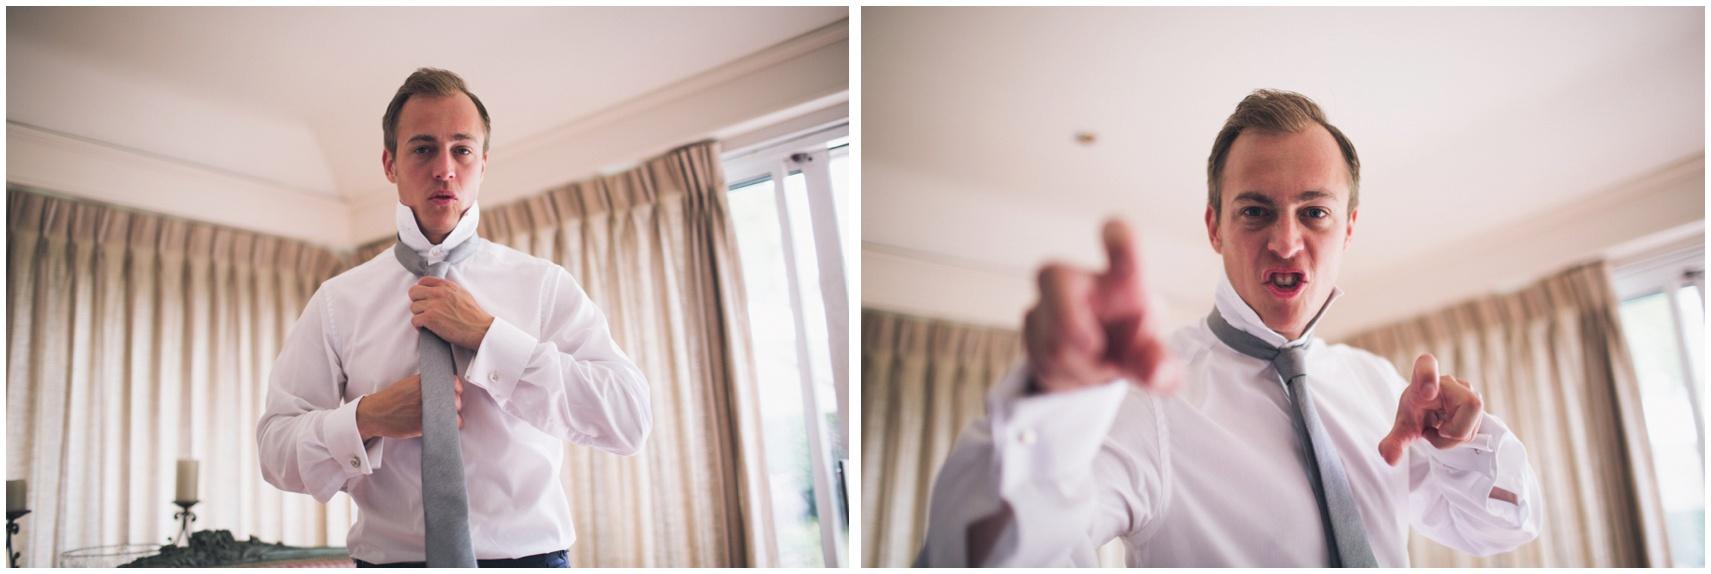 BMC Wedding photography Rutland_0260.jpg